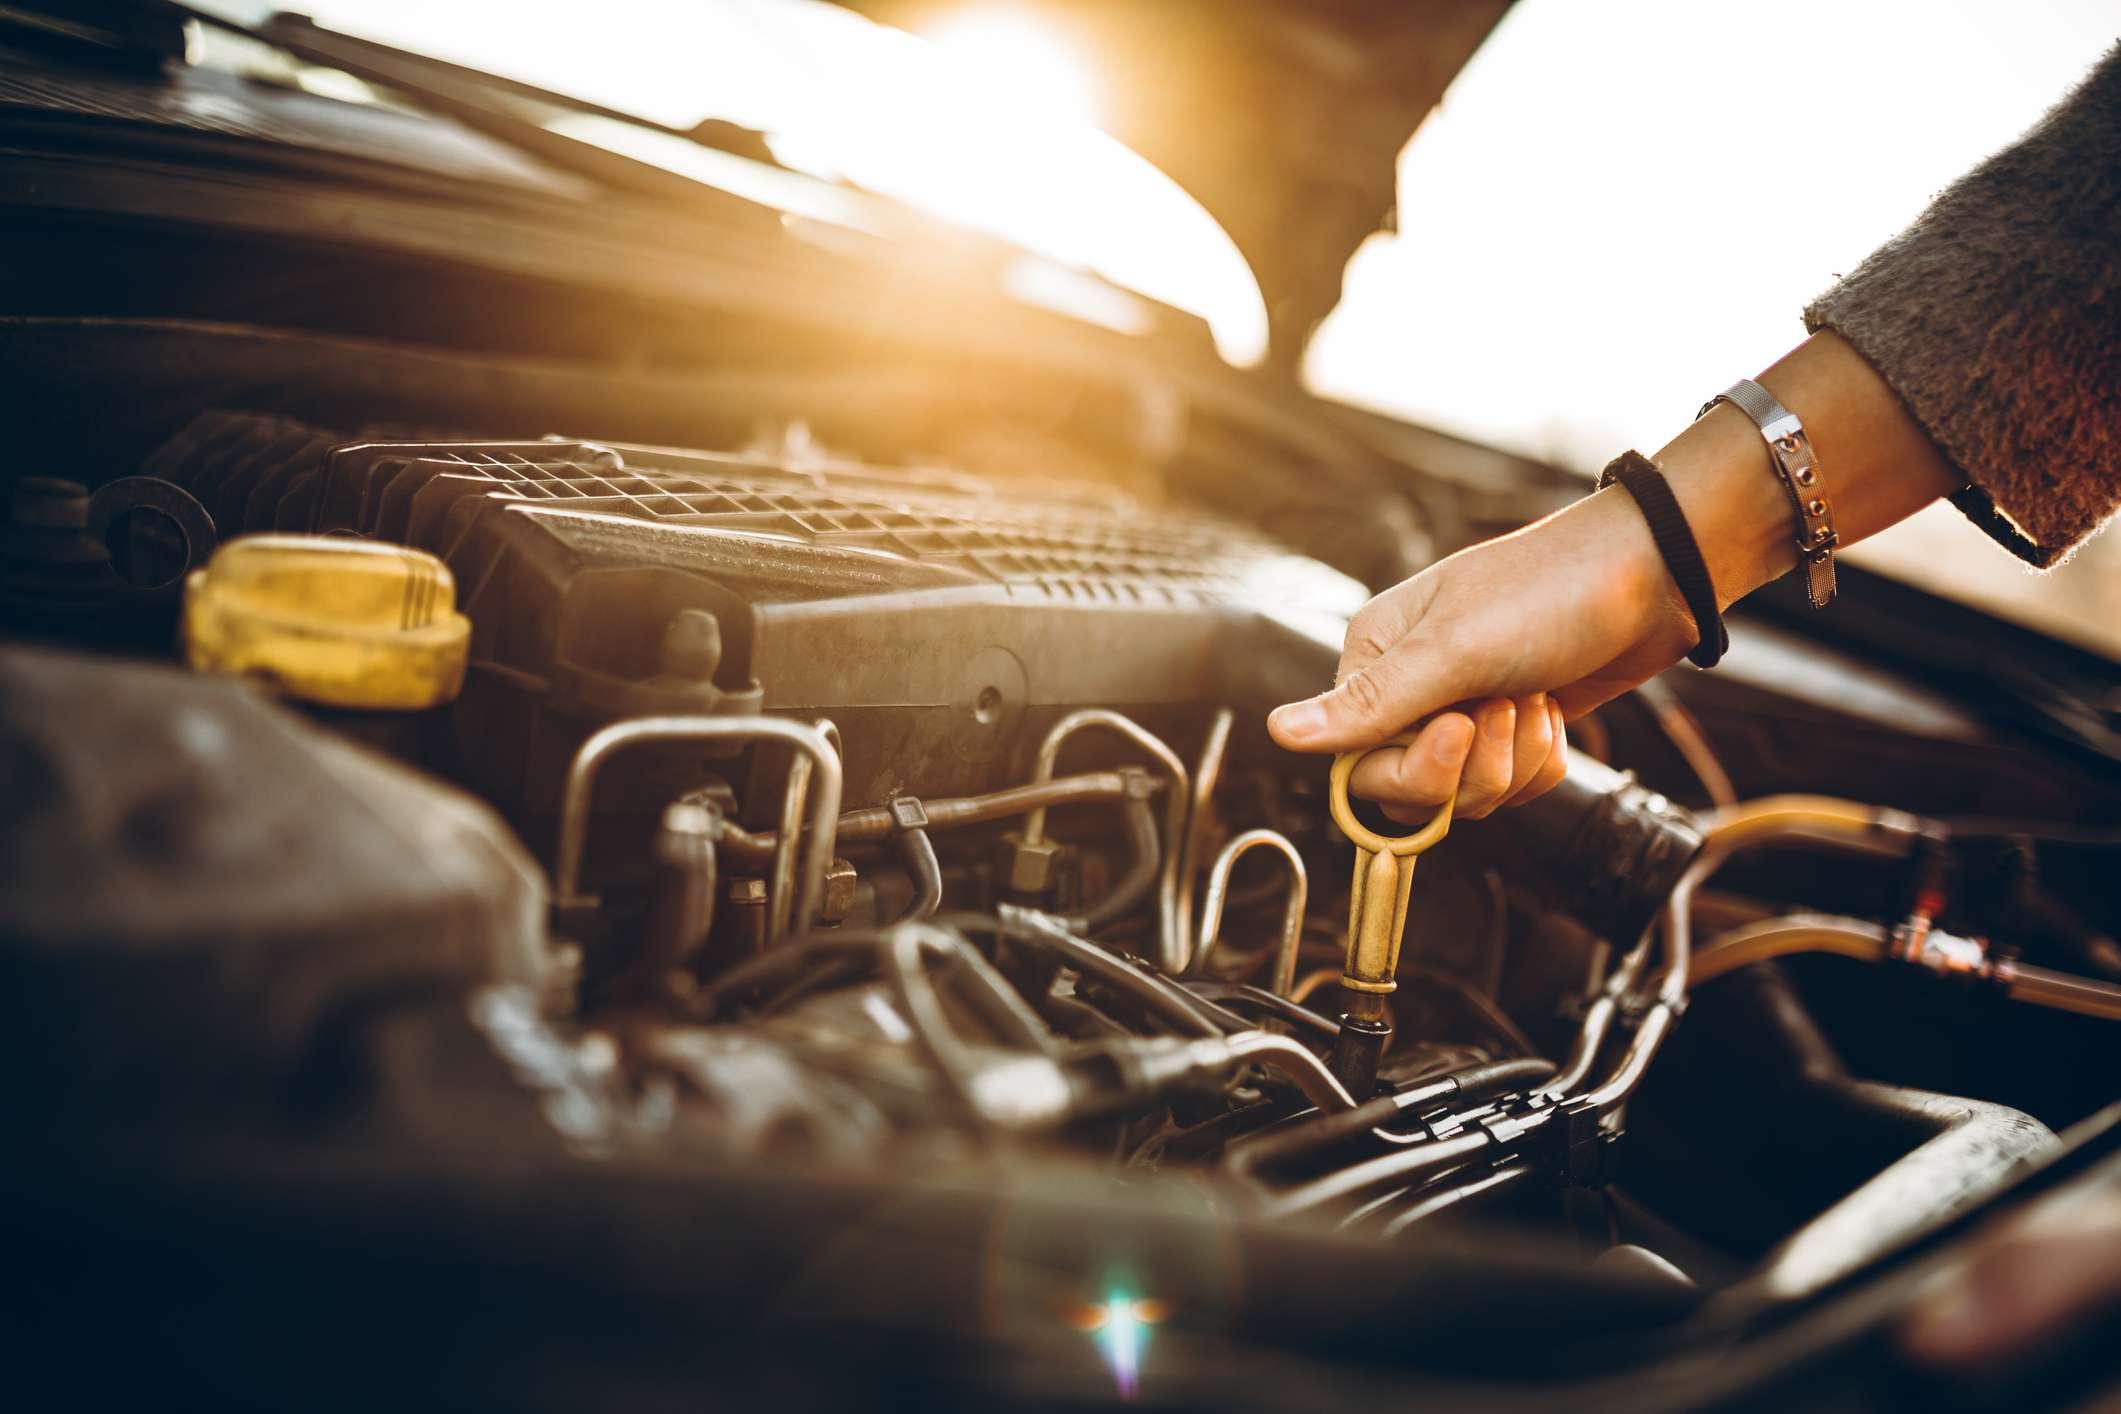 Female hand checks car oil levels